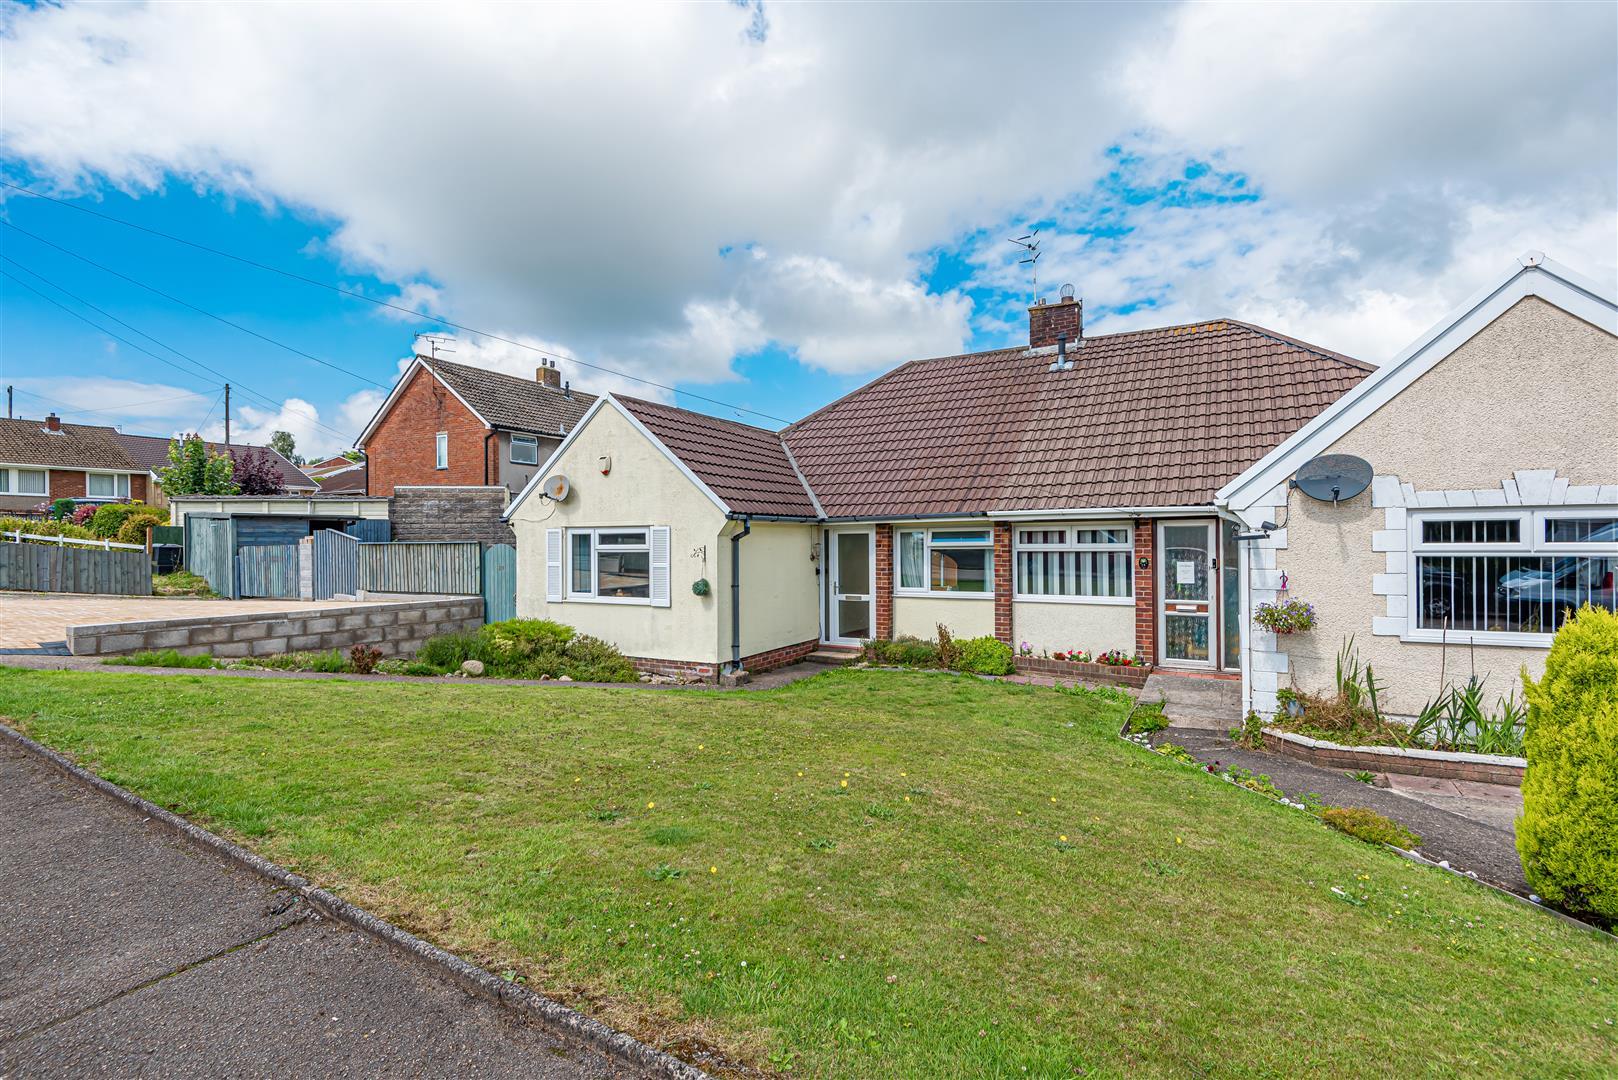 Mount Crescent, Morriston, Swansea, SA6 6AP